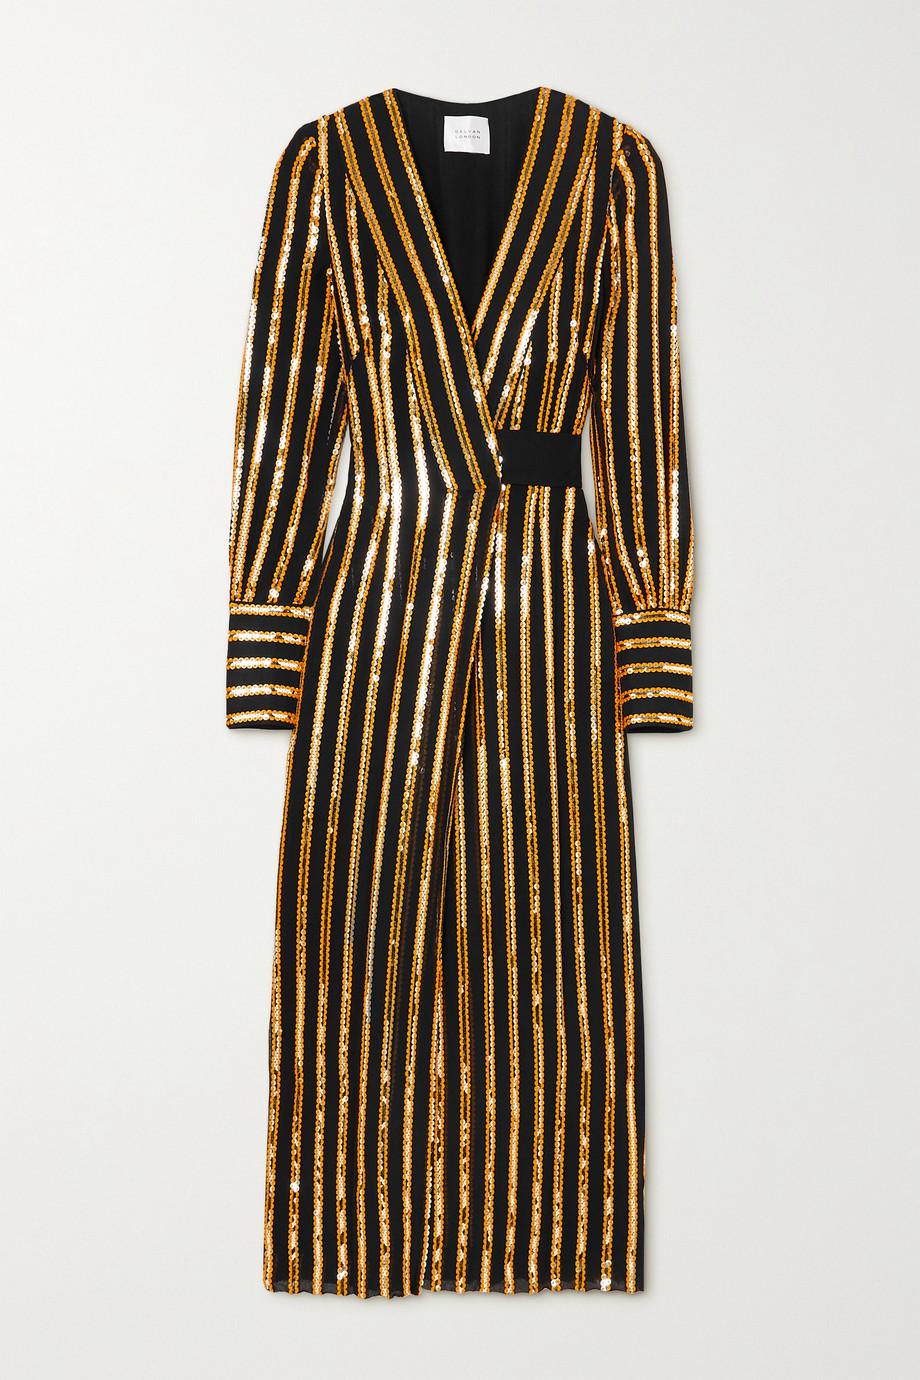 Galvan Pride sequin-embellished crepe wrap dress